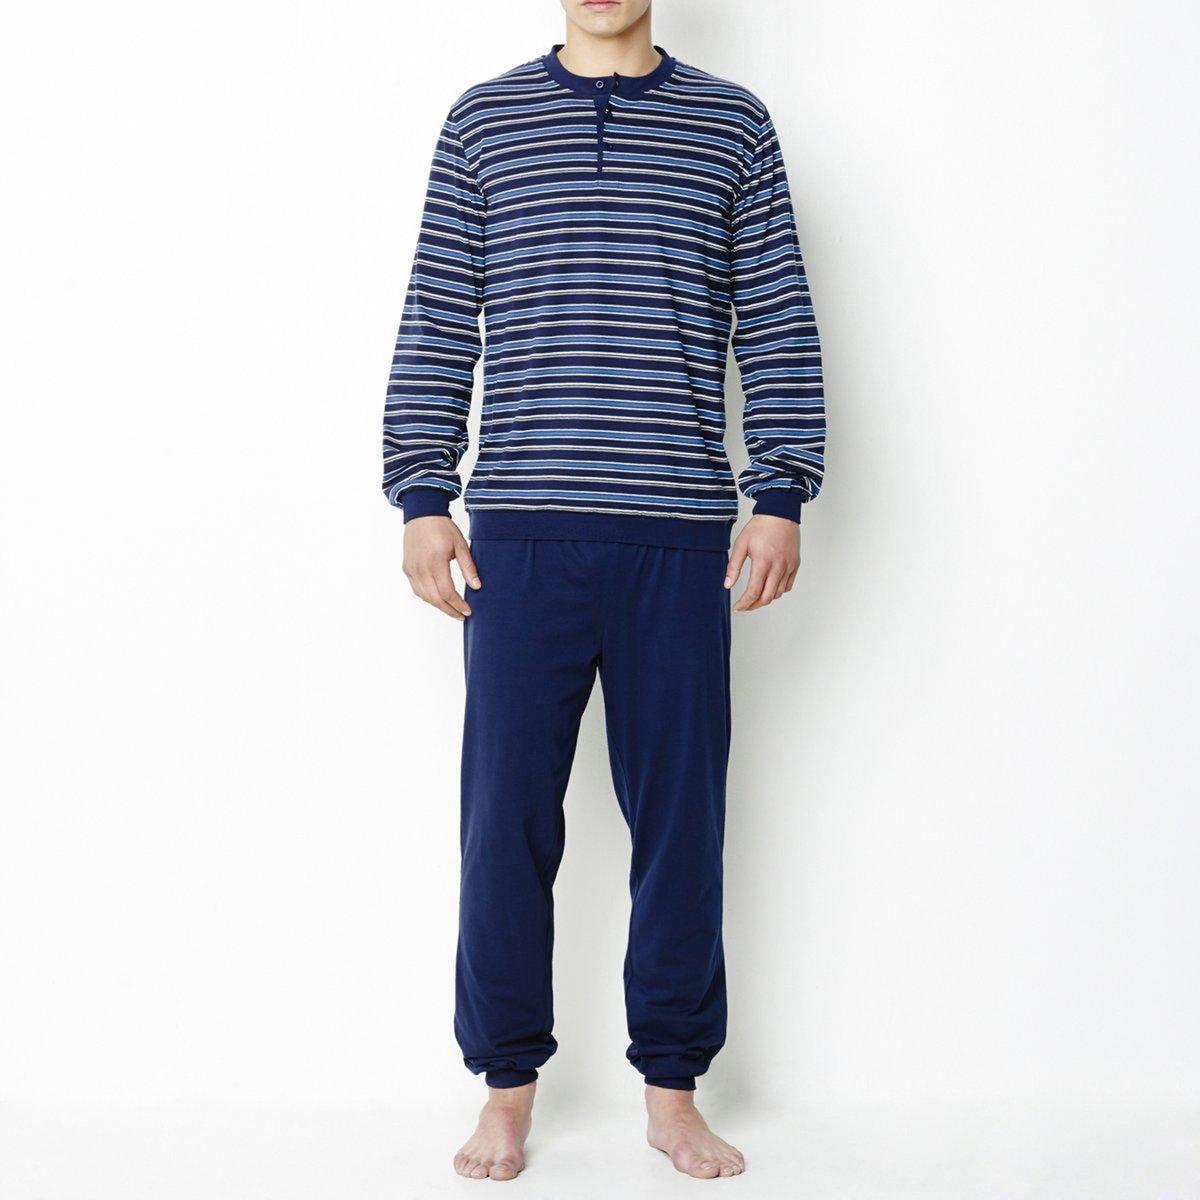 Пижама из хлопка джерси